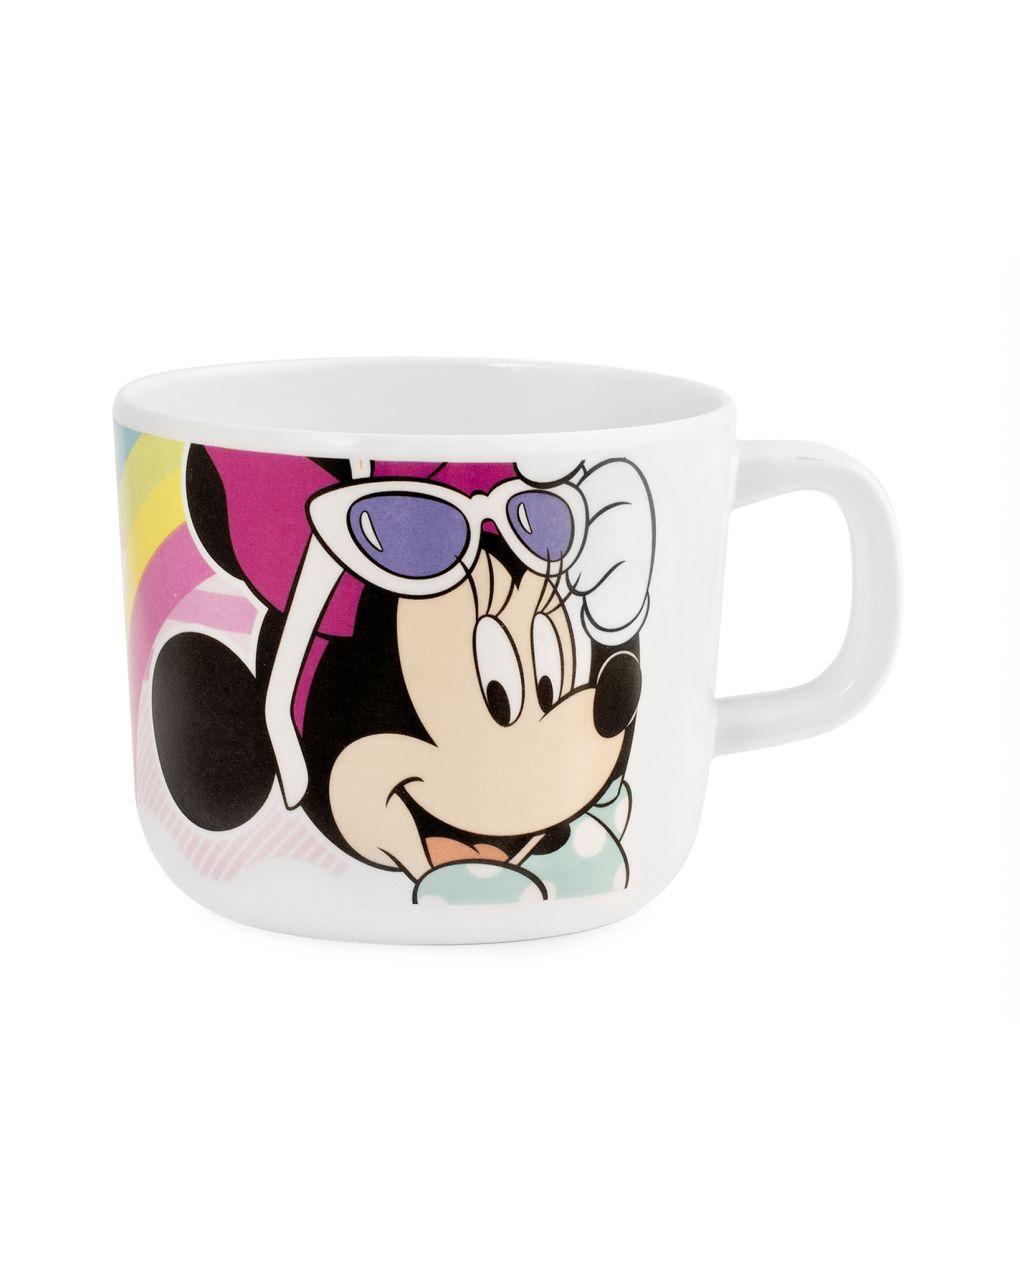 Tazza mlm - Lulabi Disney